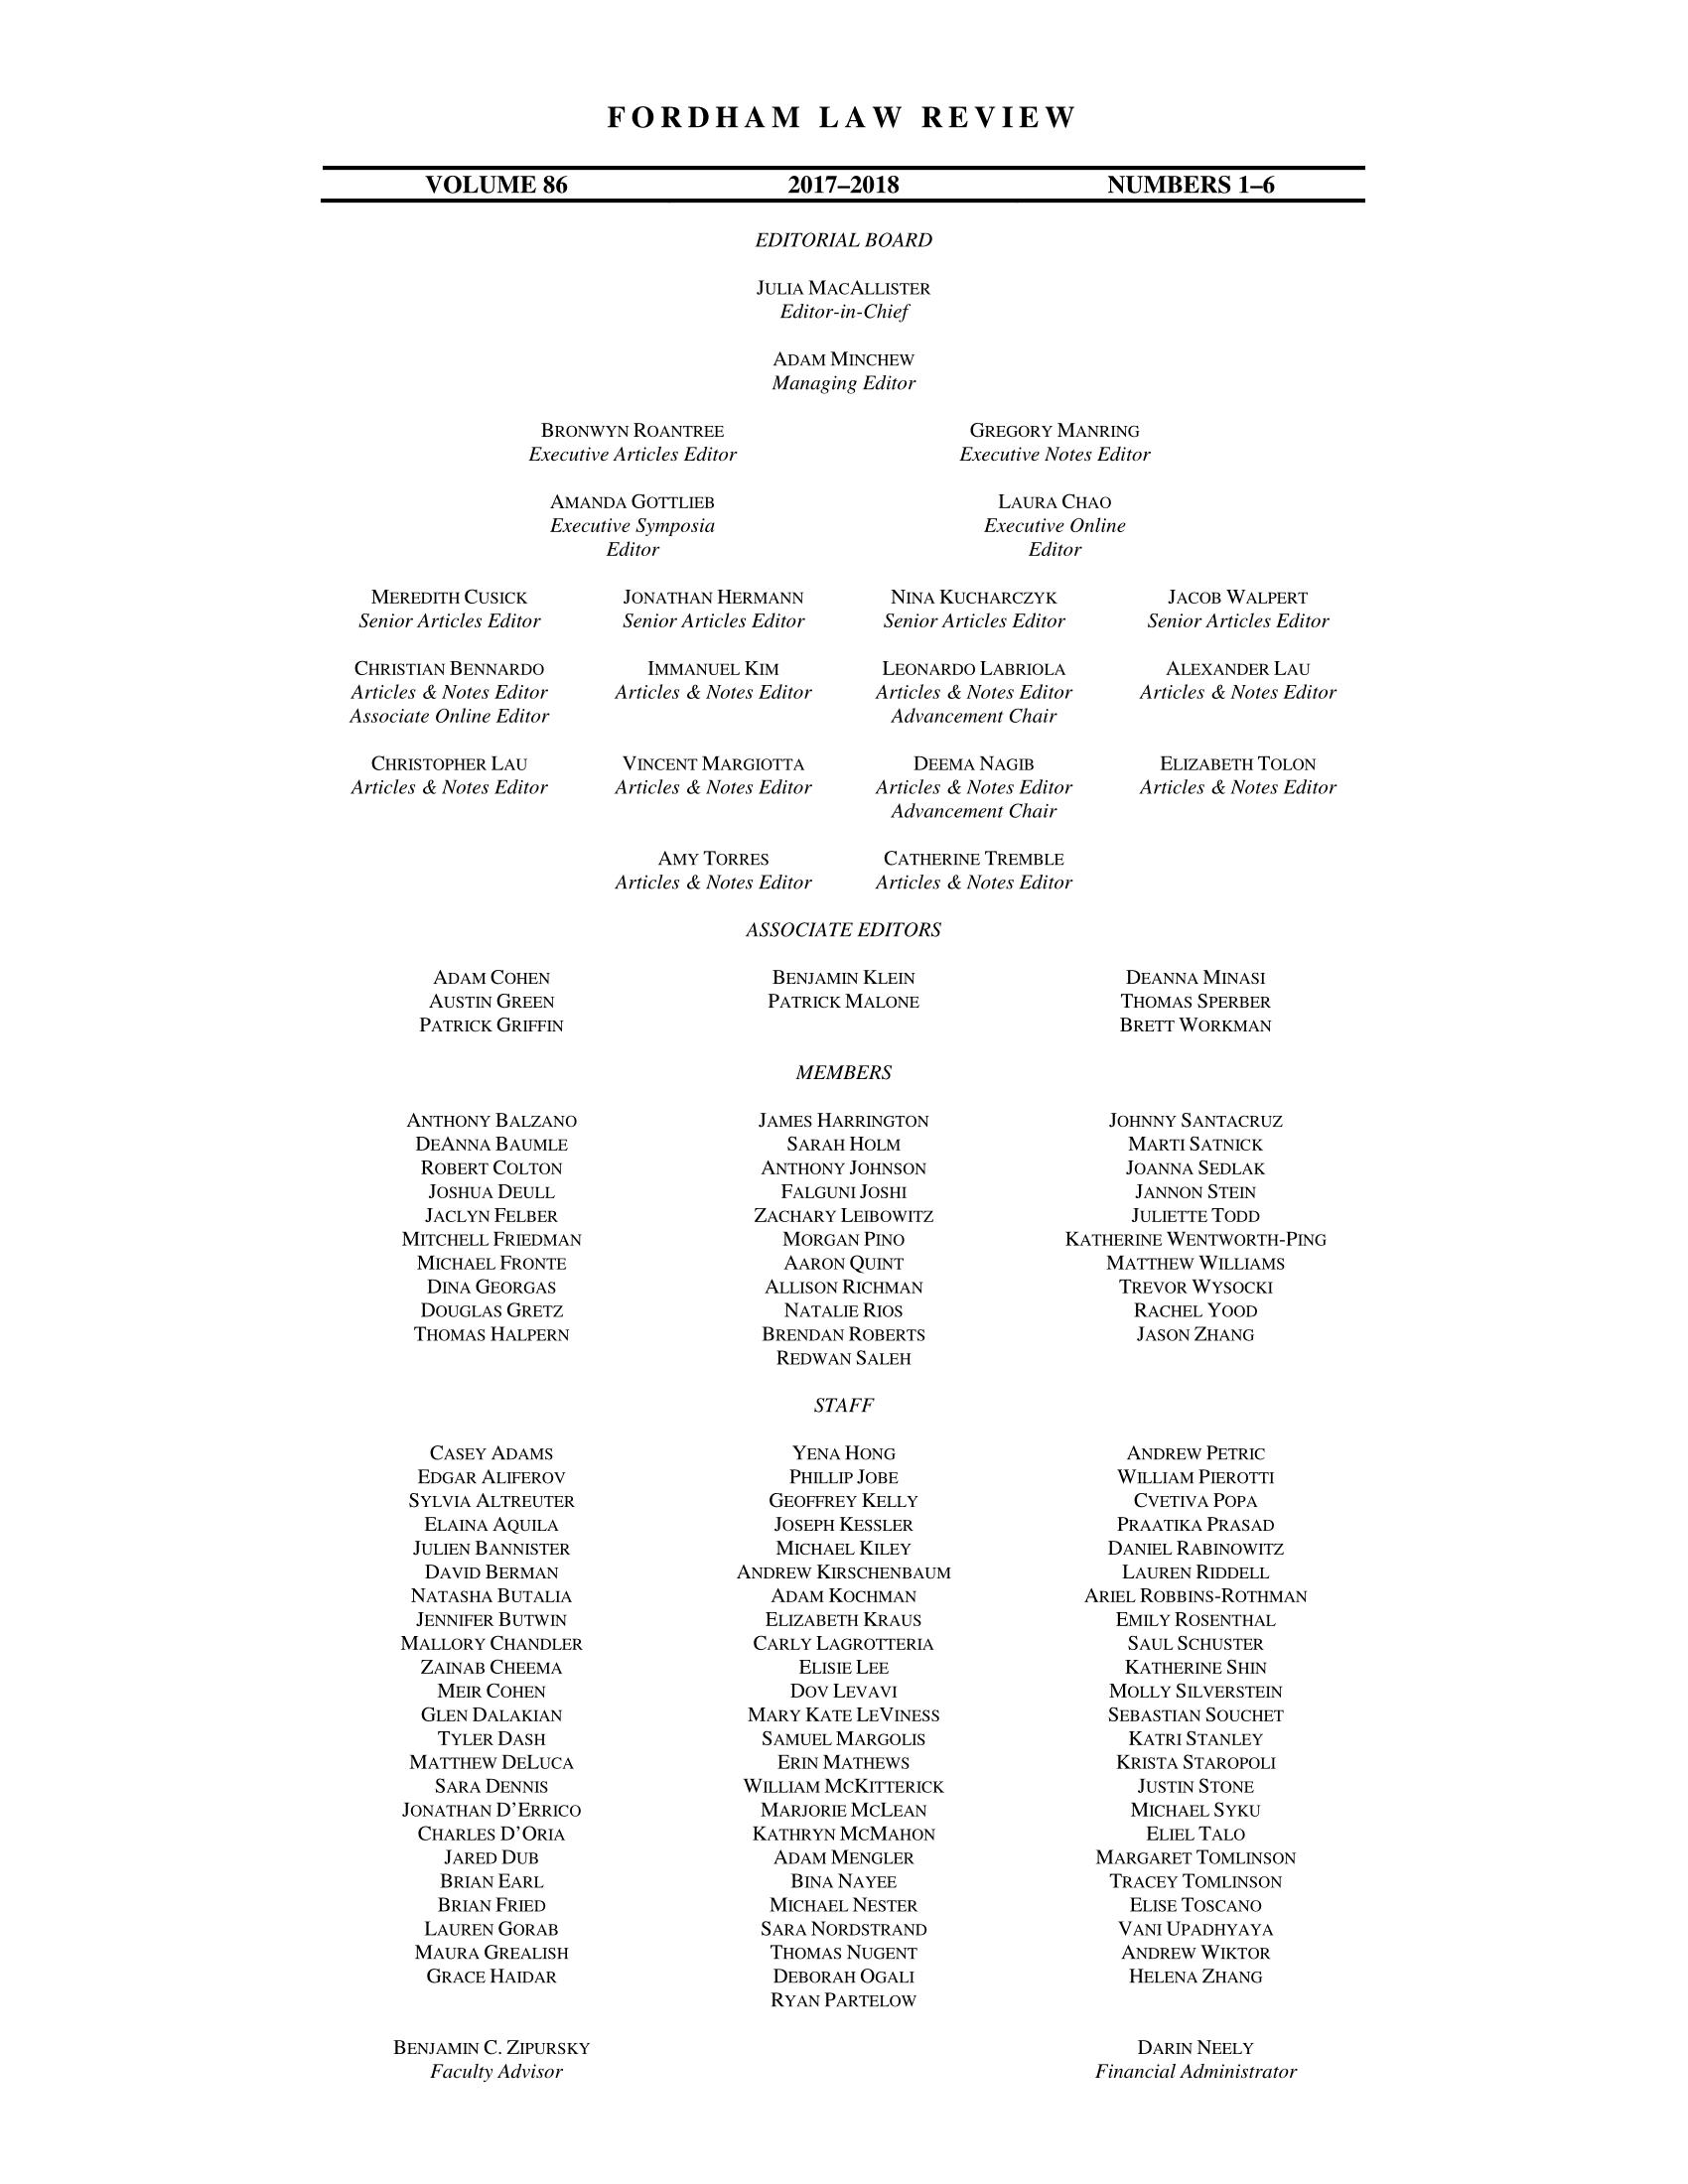 MastheadVol86v2-1